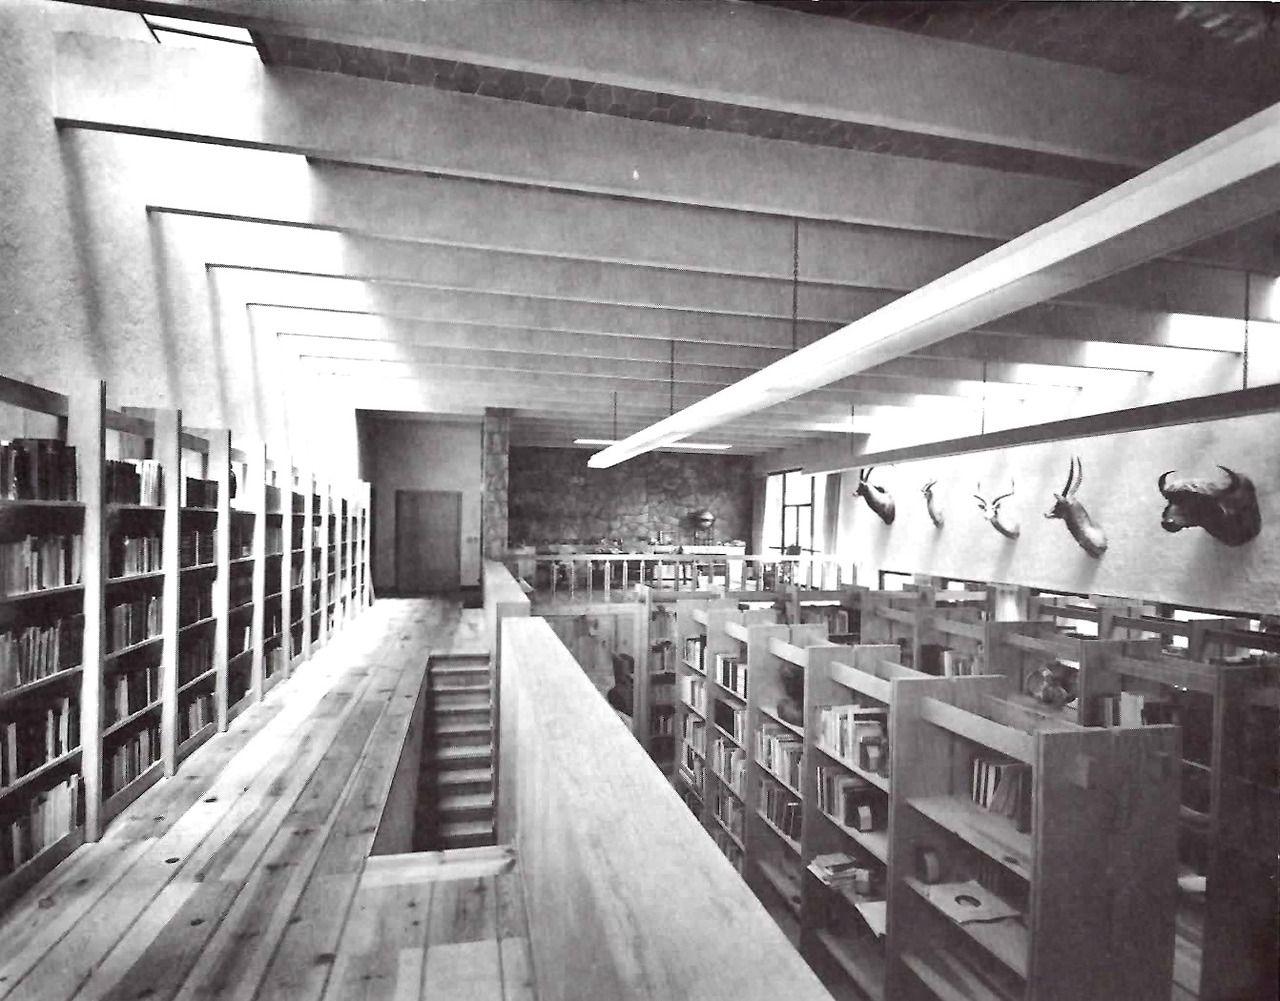 Biblioteca, Casa en Súchil, calle de Súchil 151, Jardines del Pedregal, México DF 1957   Arq. Enrique Yáñez -  Library of a house on Calle Suchil, Pedregal, Mexico City, 1957